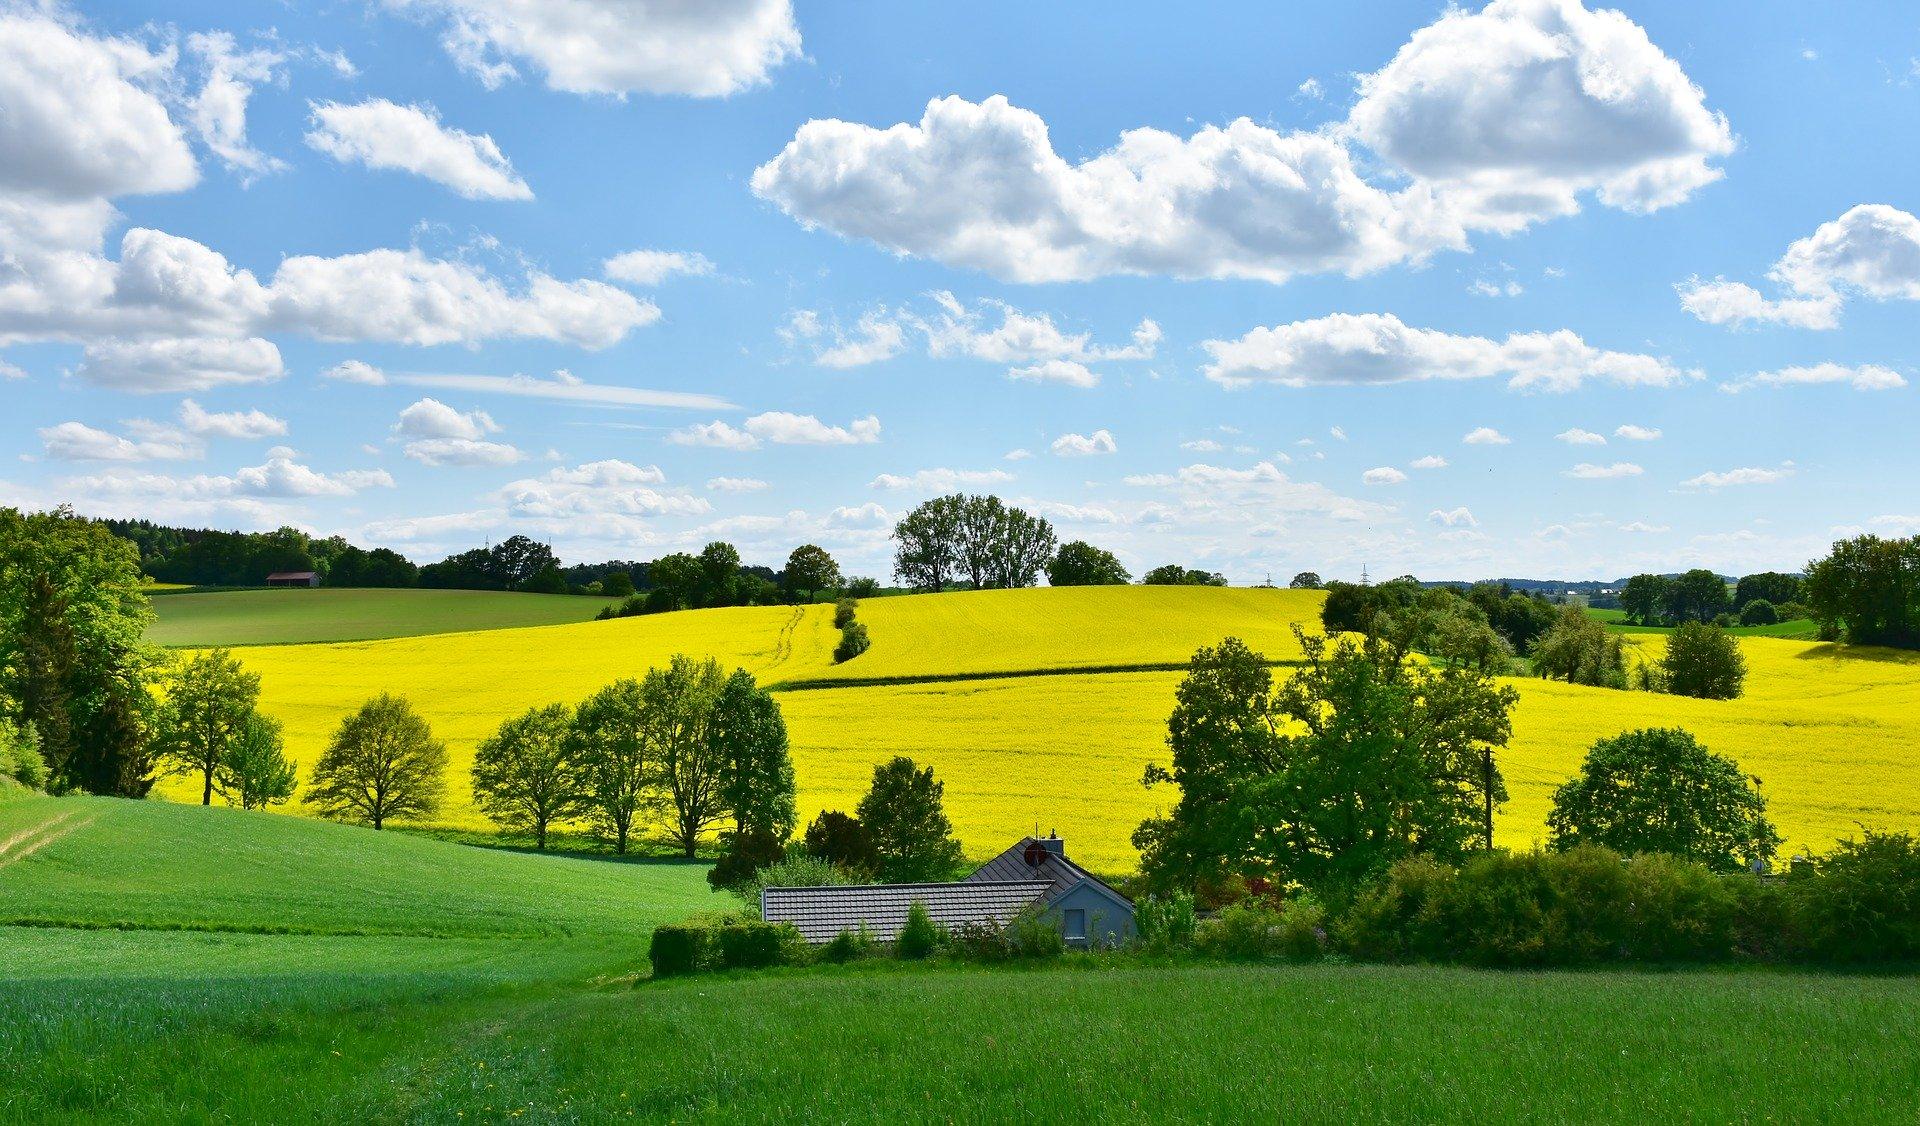 Blick auf Hügel mit Rapsfeld und Bäumen.